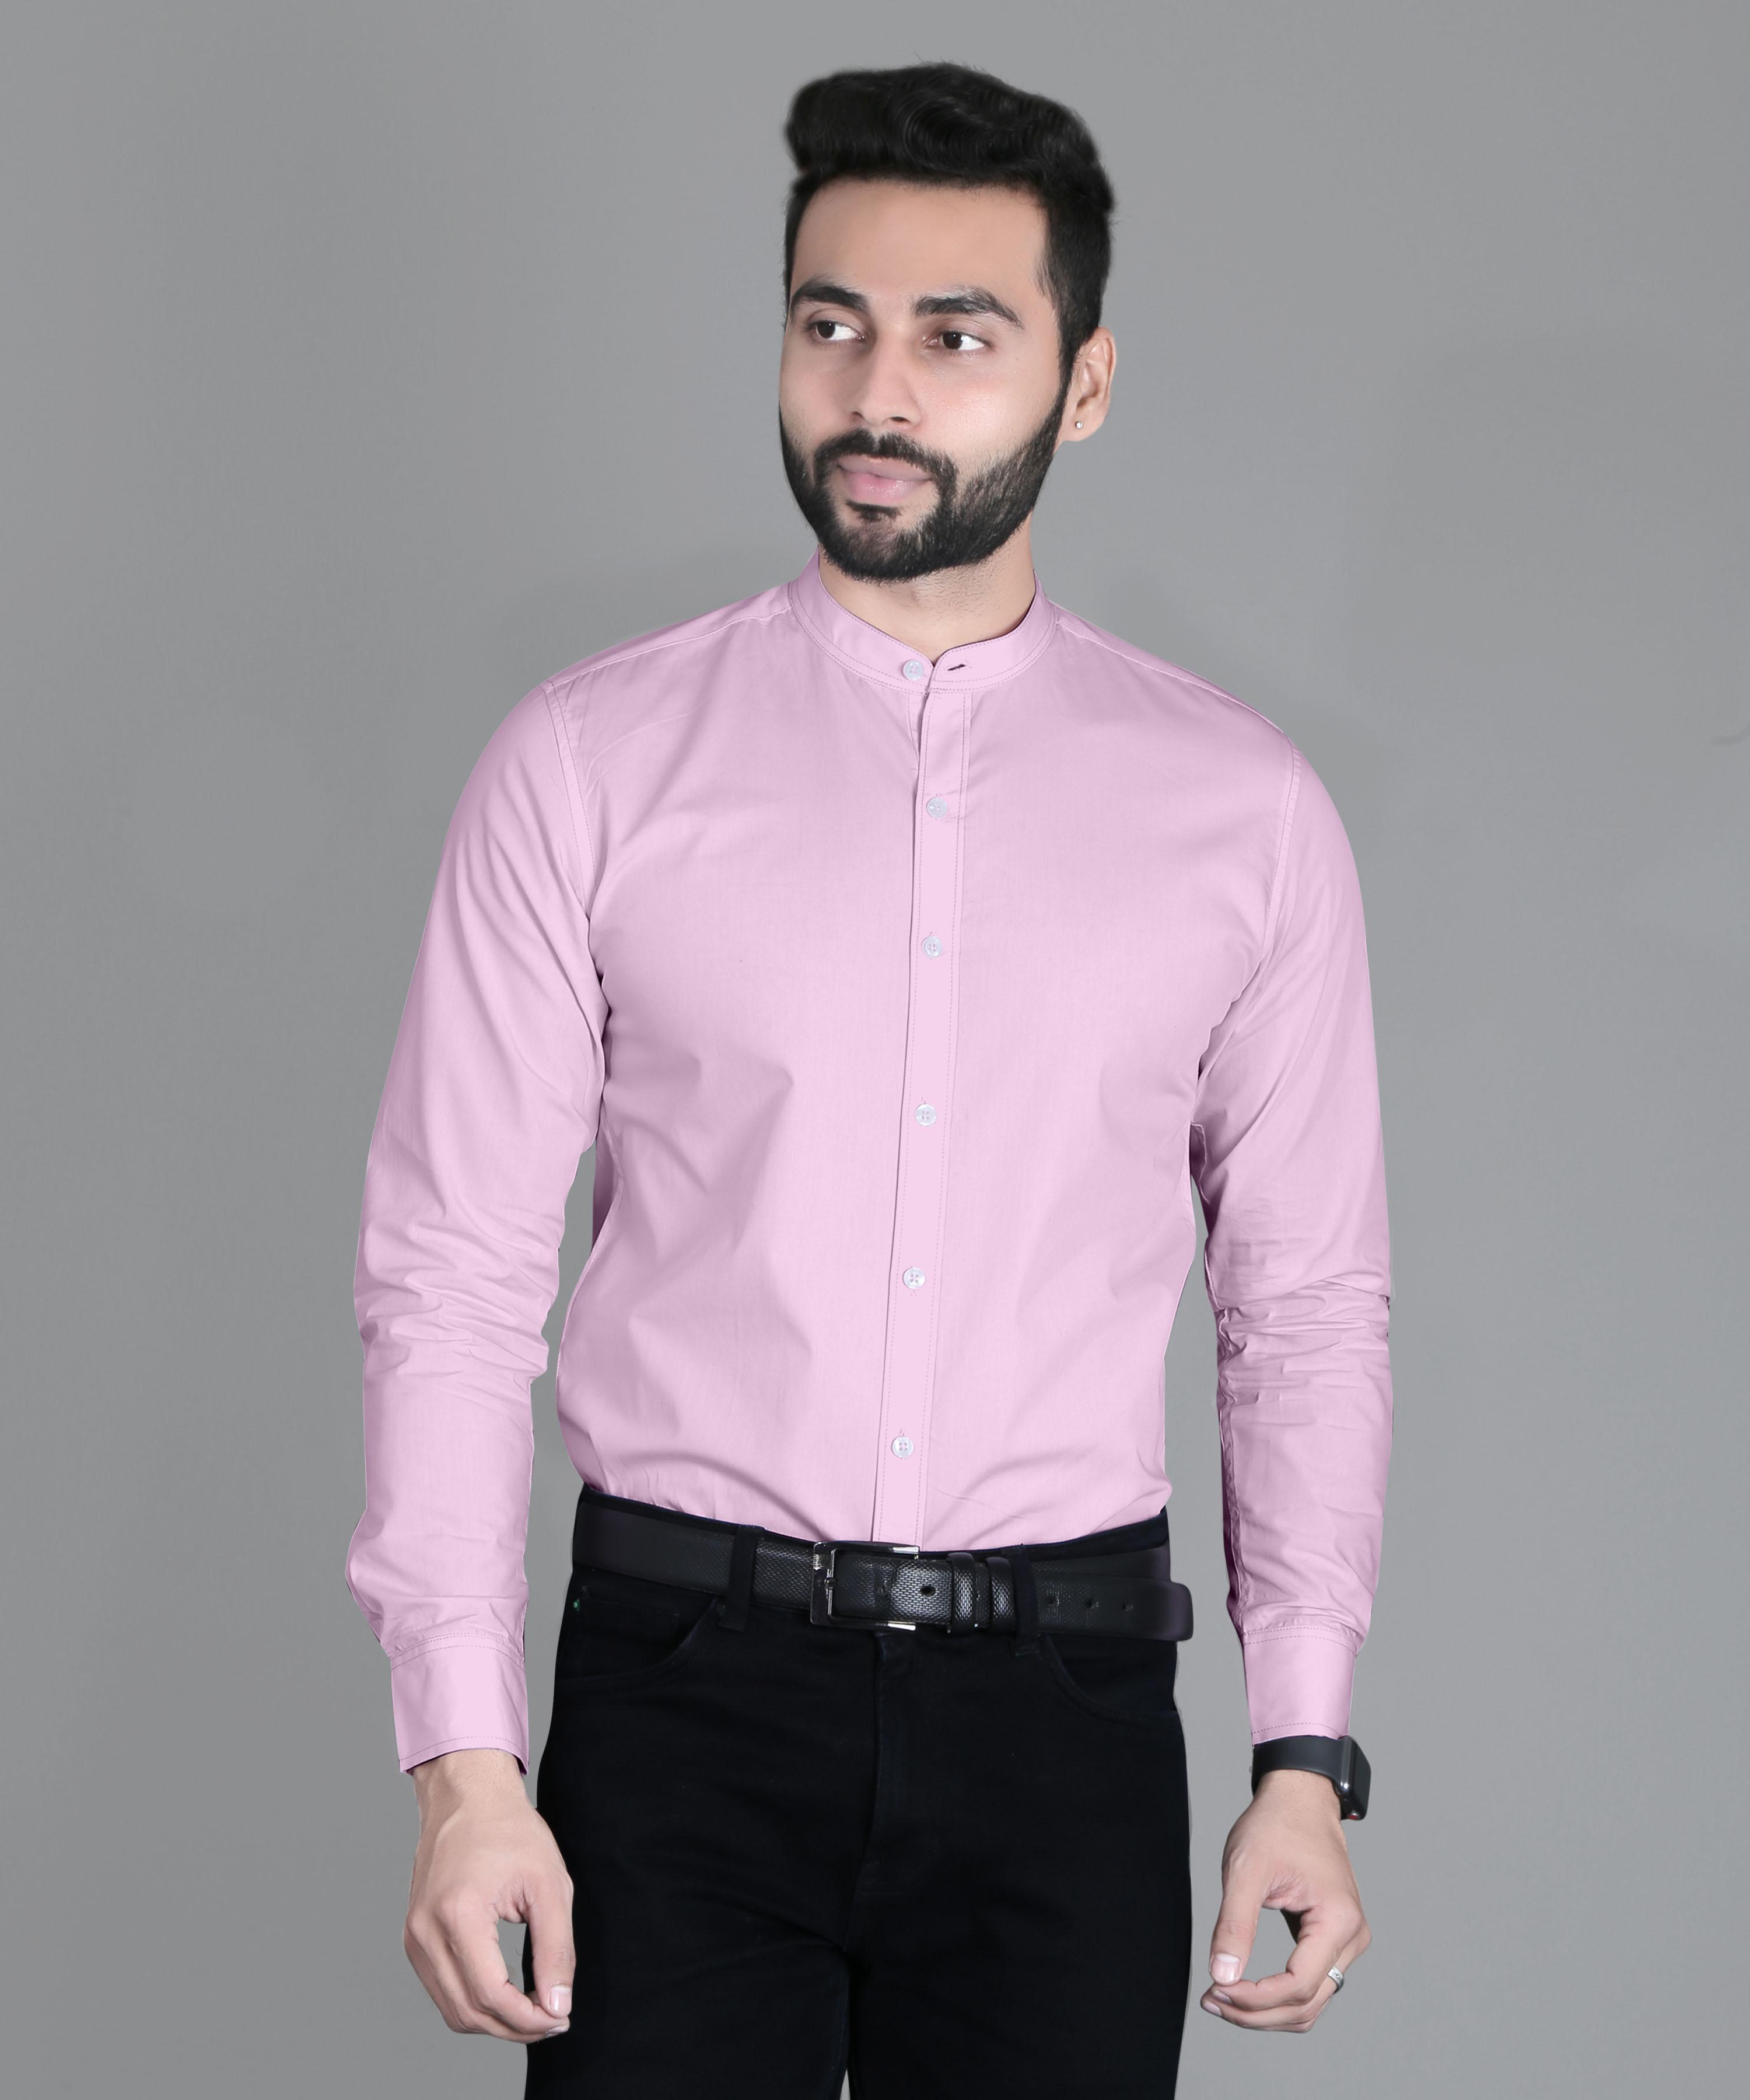 5th Anfold | FIFTH ANFOLD Formal Mandrin Collar full Sleev/Long Sleev Pink Pure Cotton Plain Solid Men Shirt